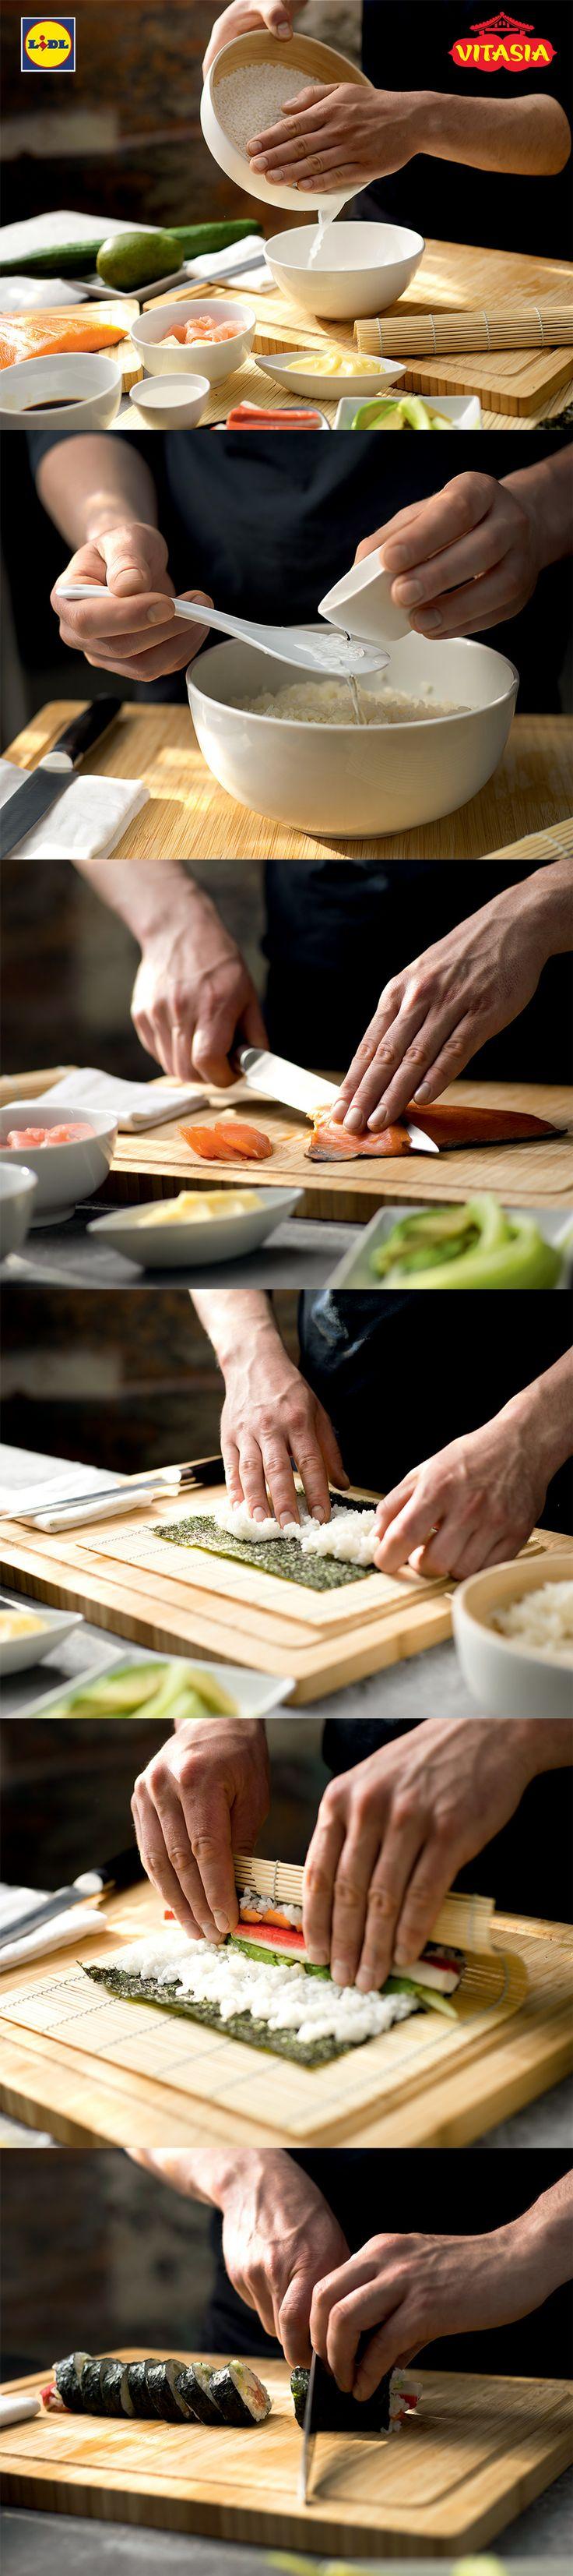 Kurs robienia sushi #sushi #home #made #kurs